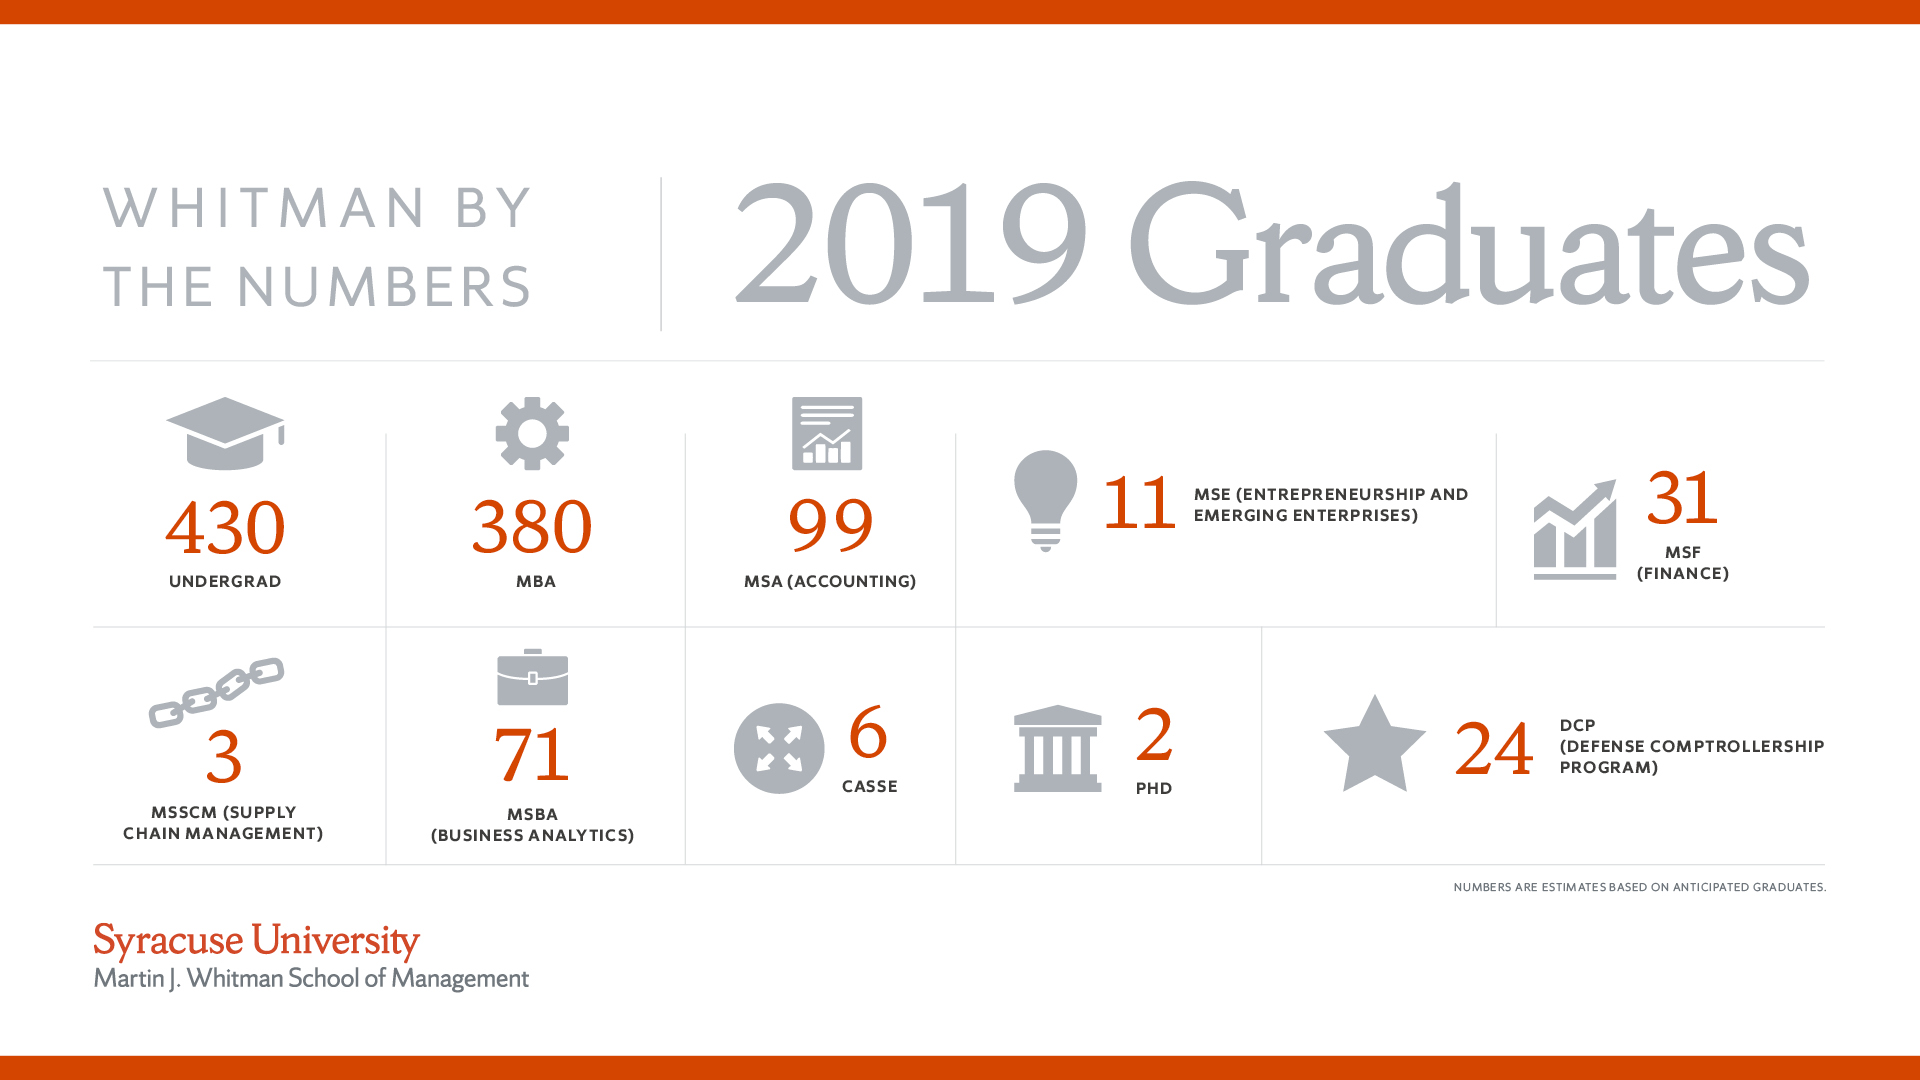 2019 graduate stats